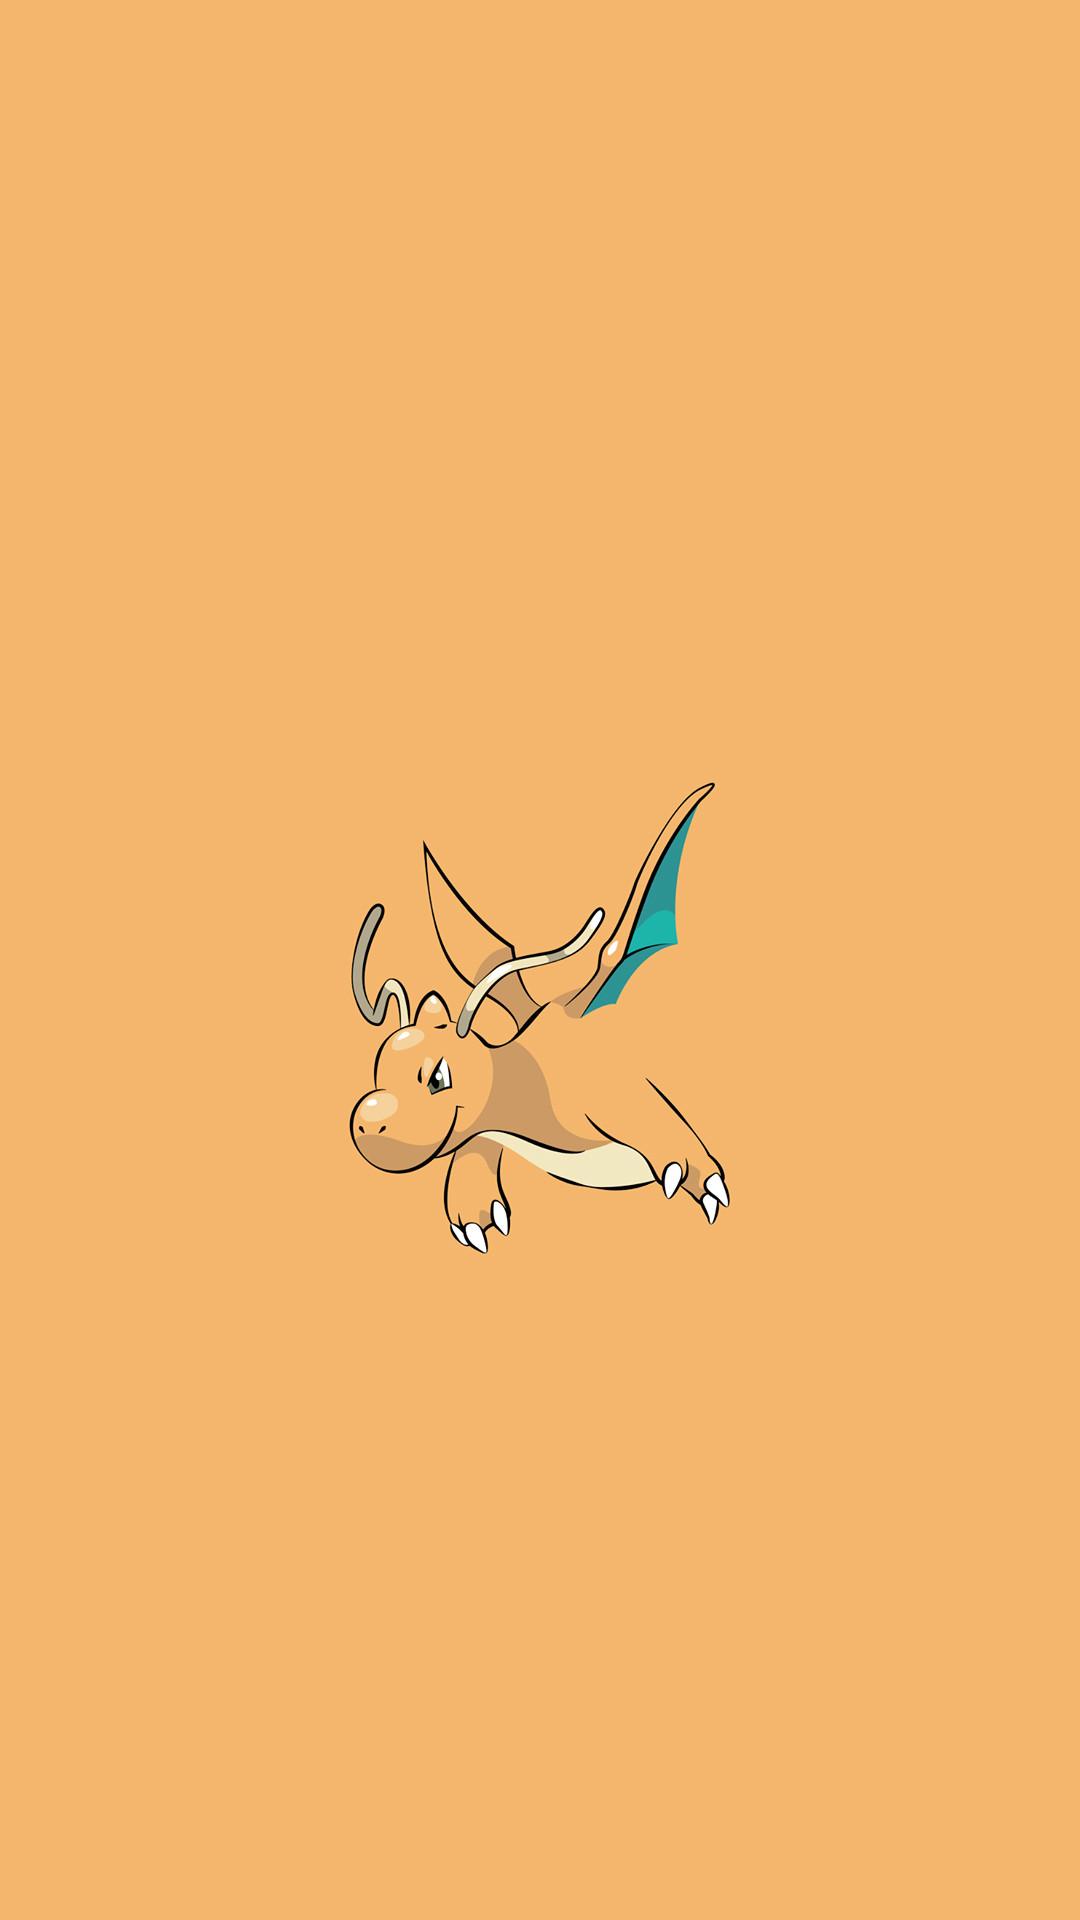 Dragonite Pokemon Character iPhone 6+ HD Wallpaper –  https://freebestpicture.com